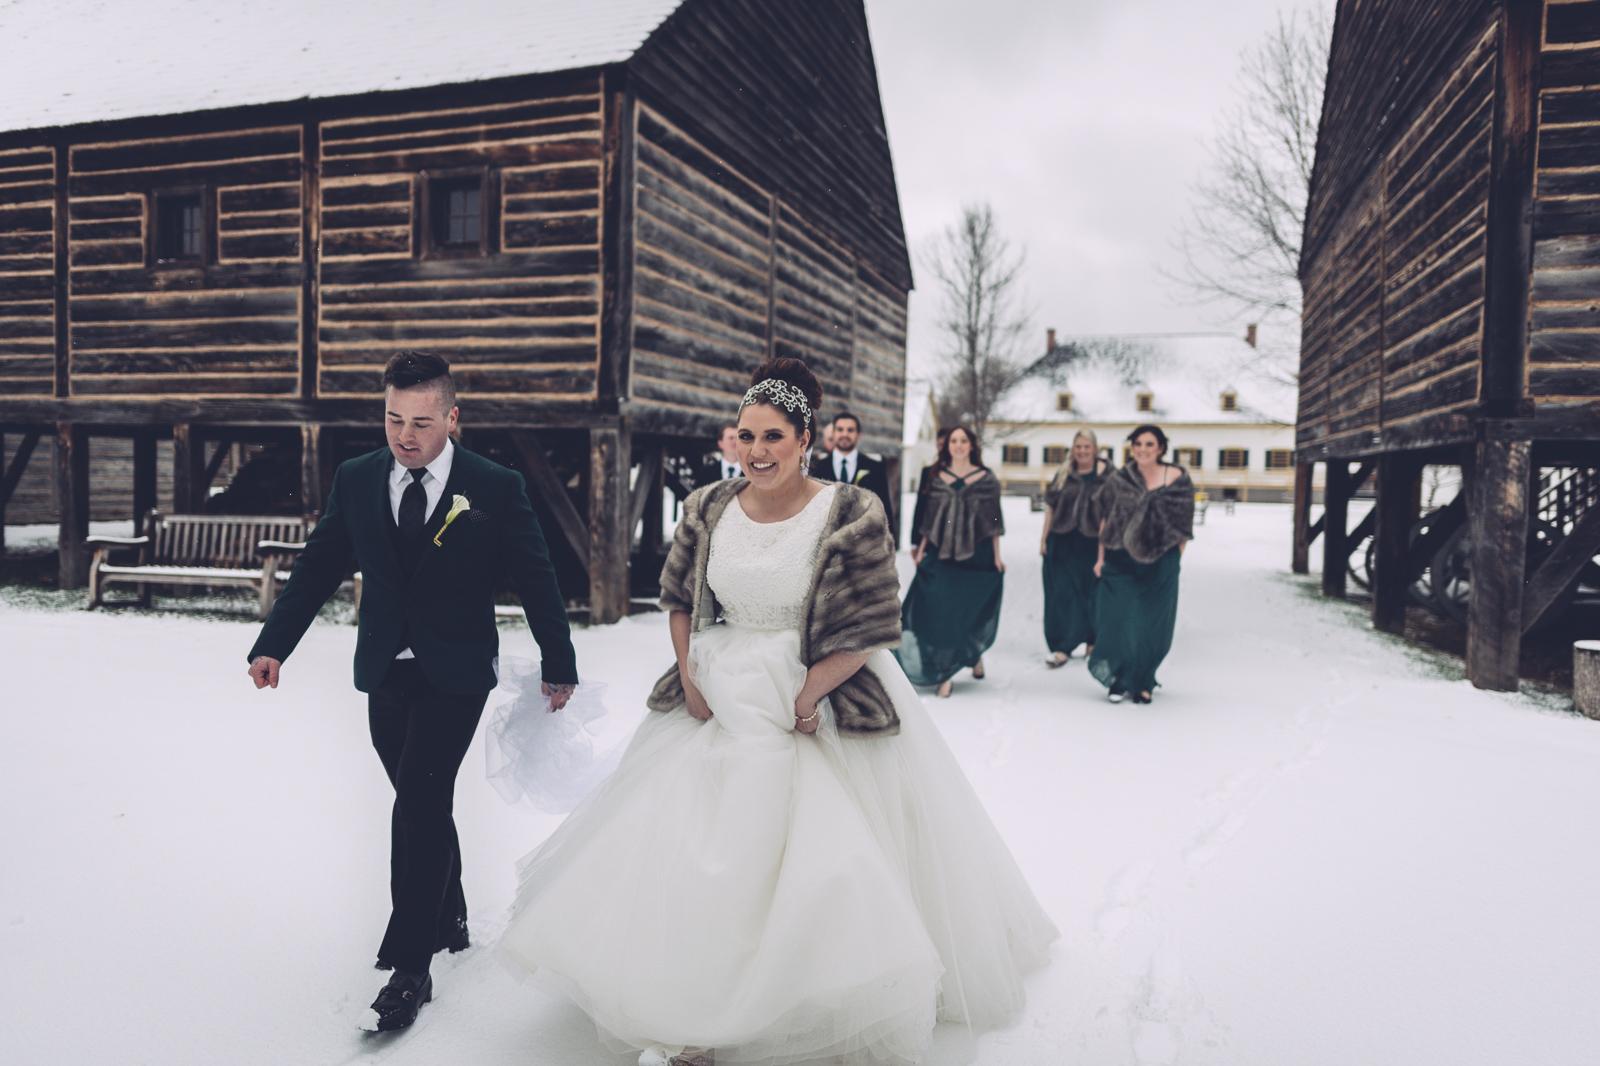 chrystal_joshua_wedding_blog53.jpg